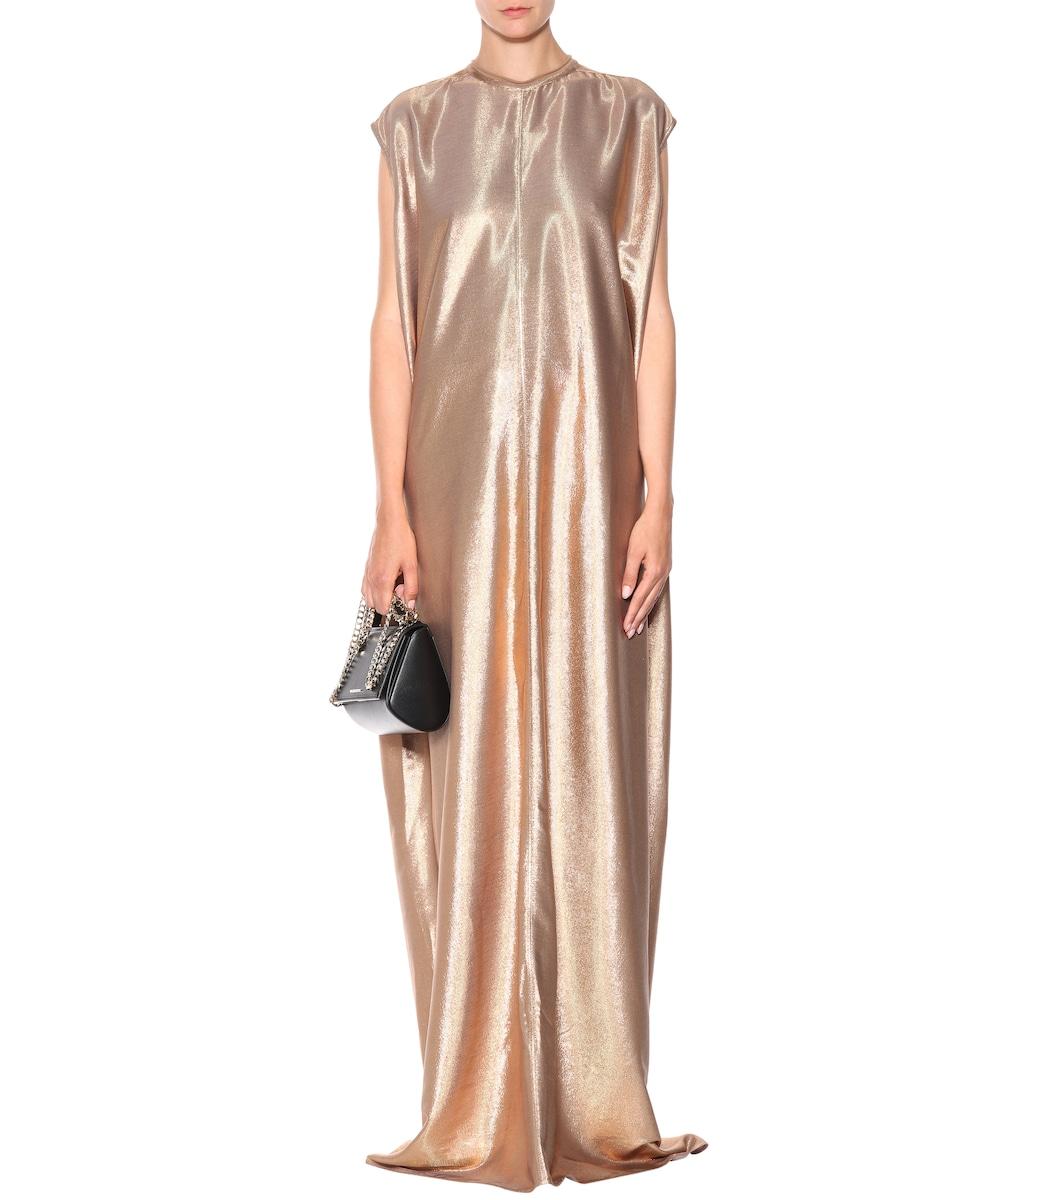 43b1b0d69 Rick Owens - فستان سهرة لاميه | Mytheresa